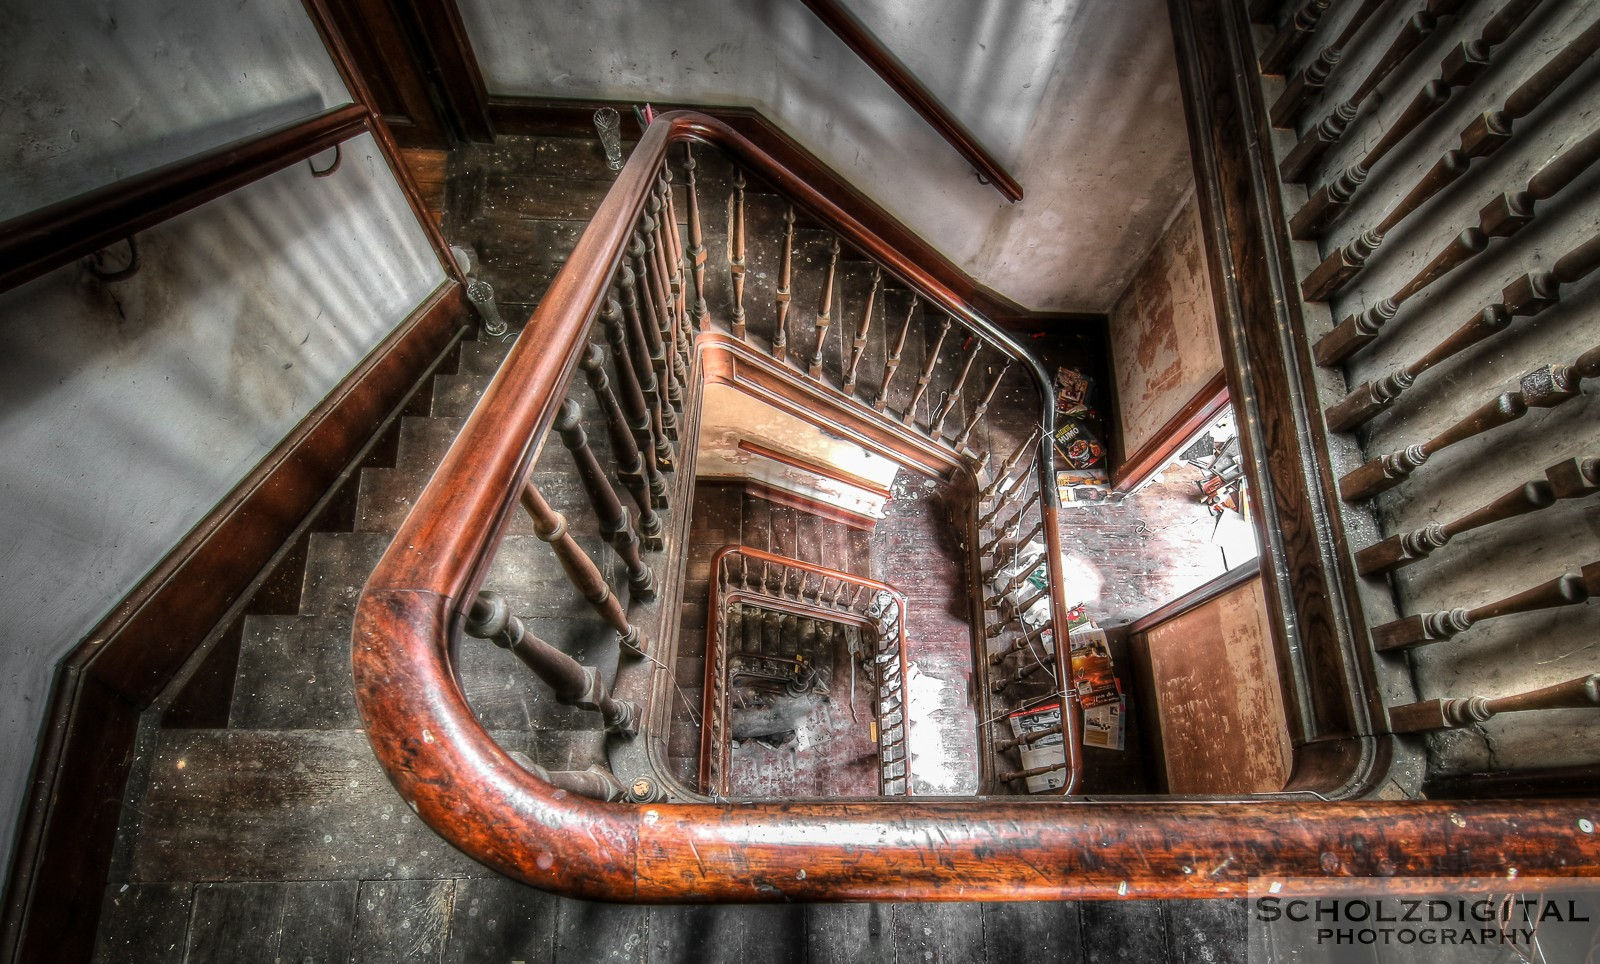 Abandoned, Chateau Hohner, HDR, Lost Place, UE, Urban exploration, Urbex, verlassen, Verlassene Orte, Verlassene Orte in Belgien, verlaten